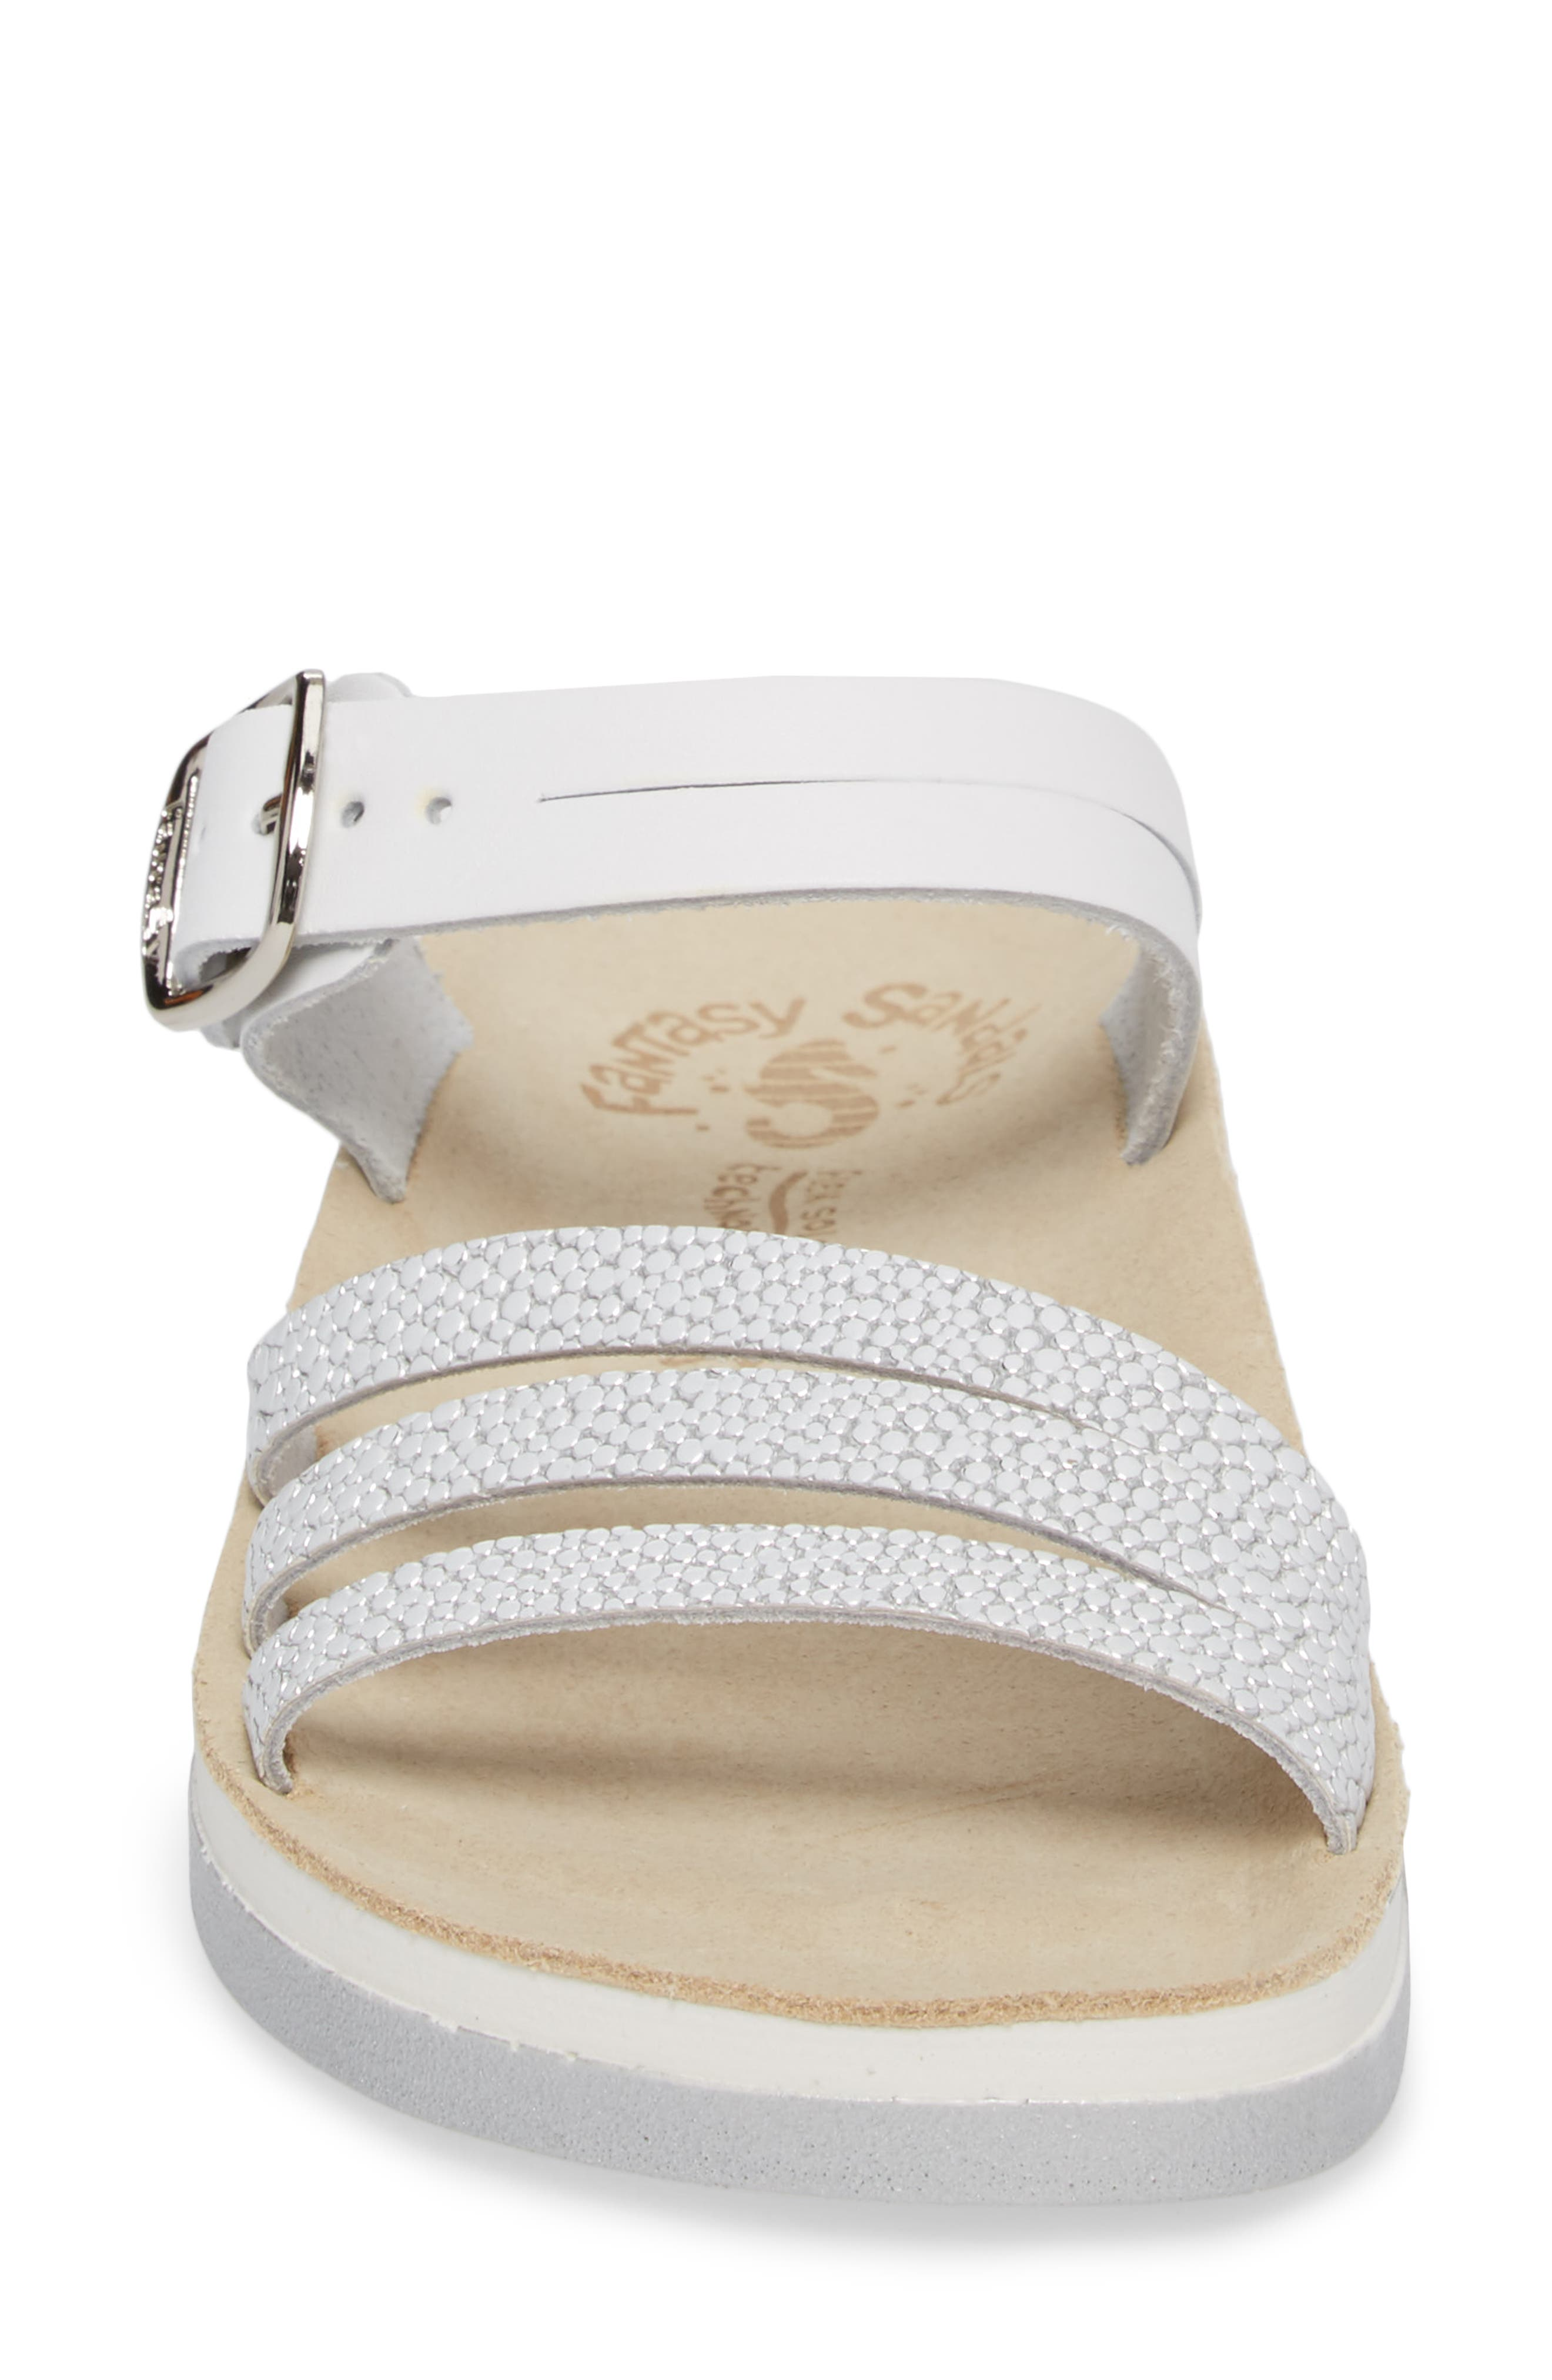 Lola Sandal,                             Alternate thumbnail 4, color,                             White/ Silver Leather